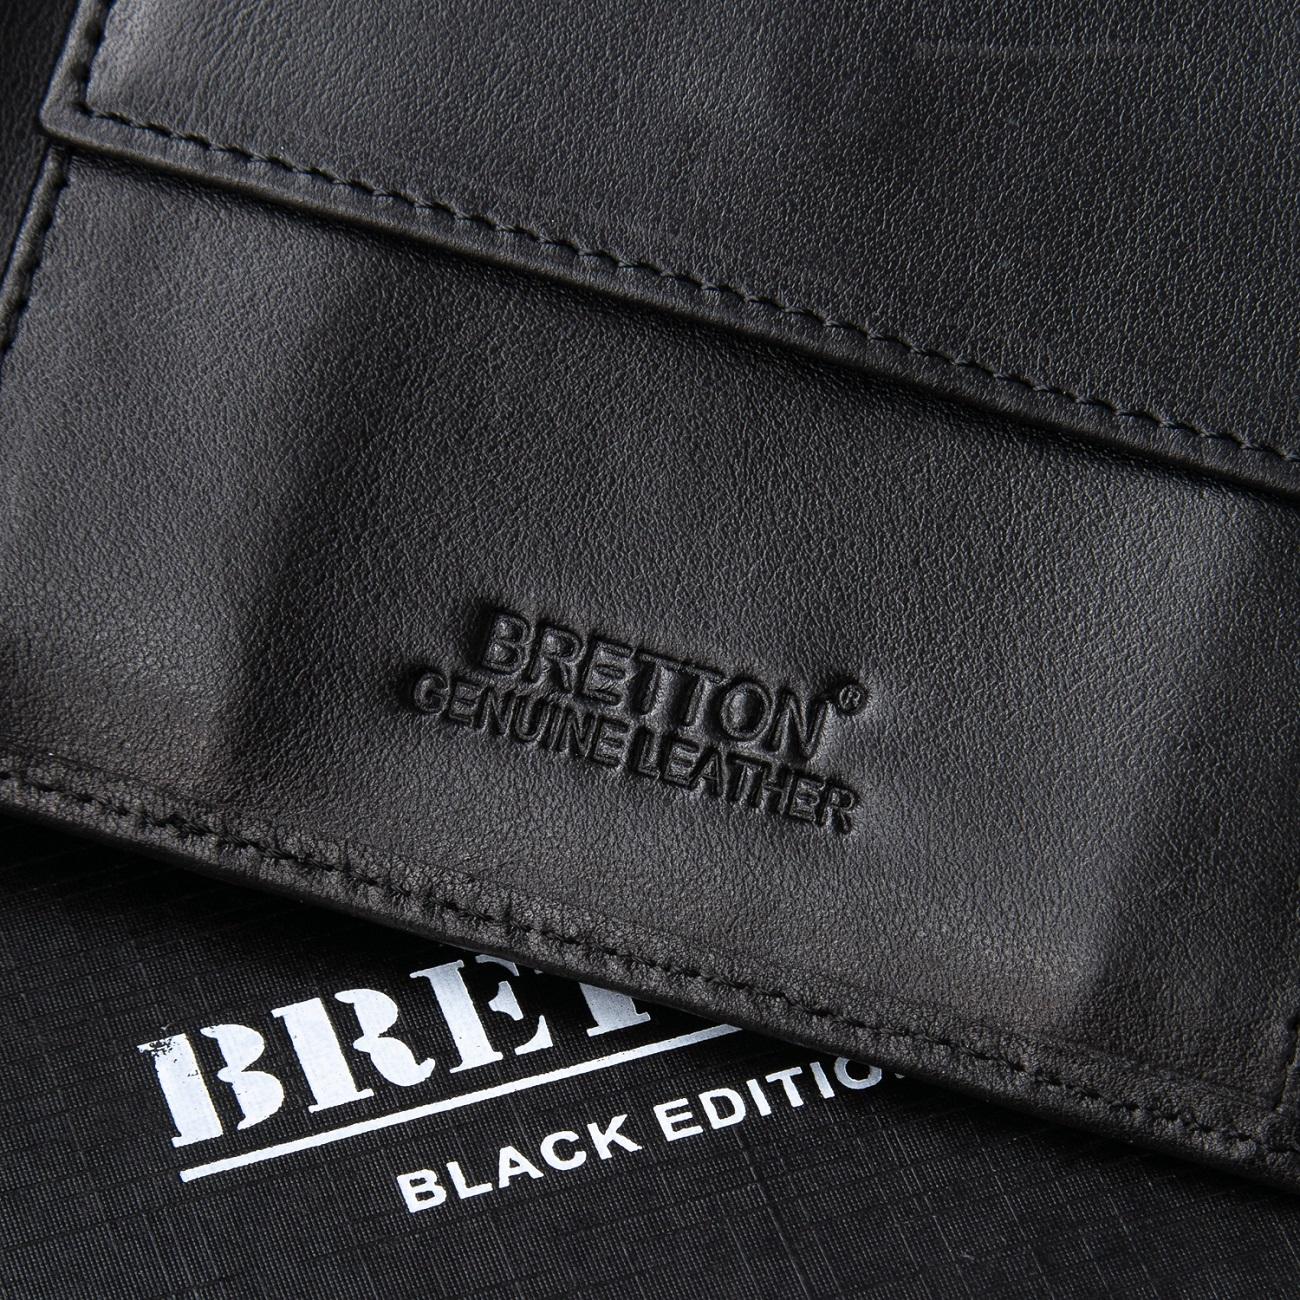 Кошелек NAPPA кожа BRETTON M3707 black - фото 4